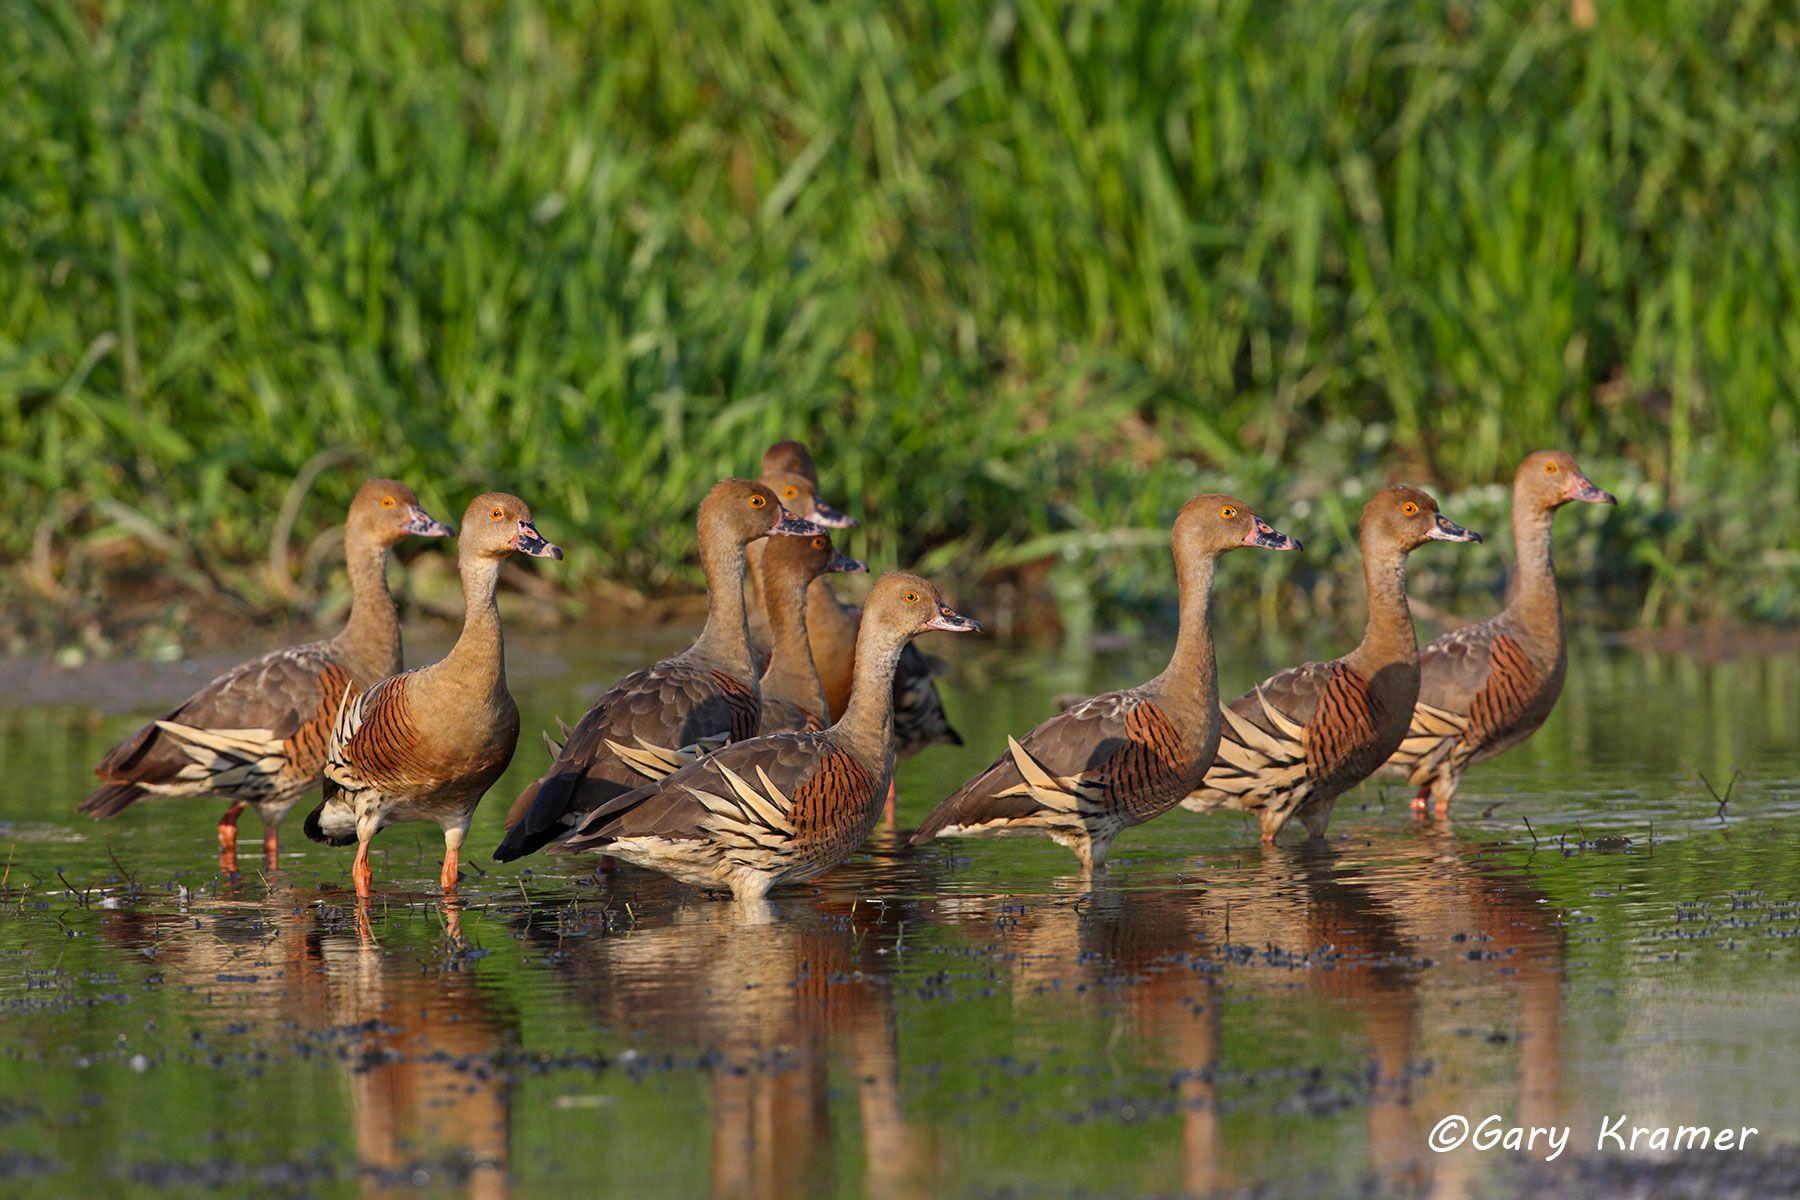 Plumed Whistling Duck (Dendrocygna eytoni) Australia - OBWWp#160d